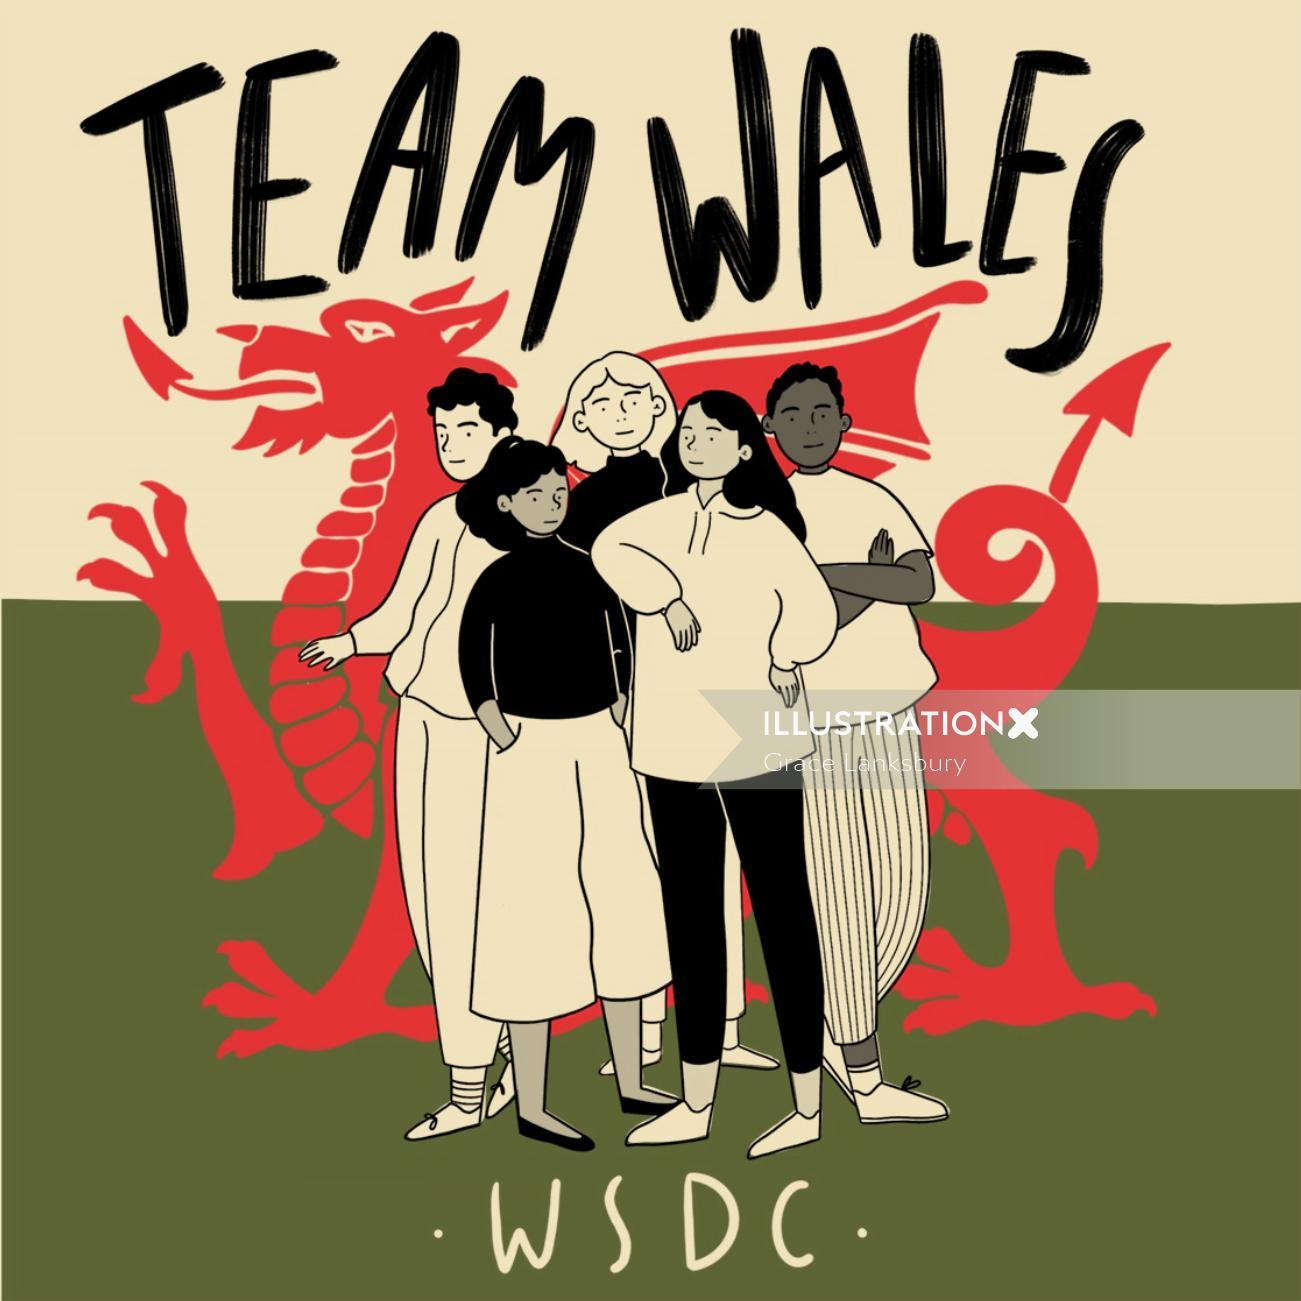 Team wales graphic design